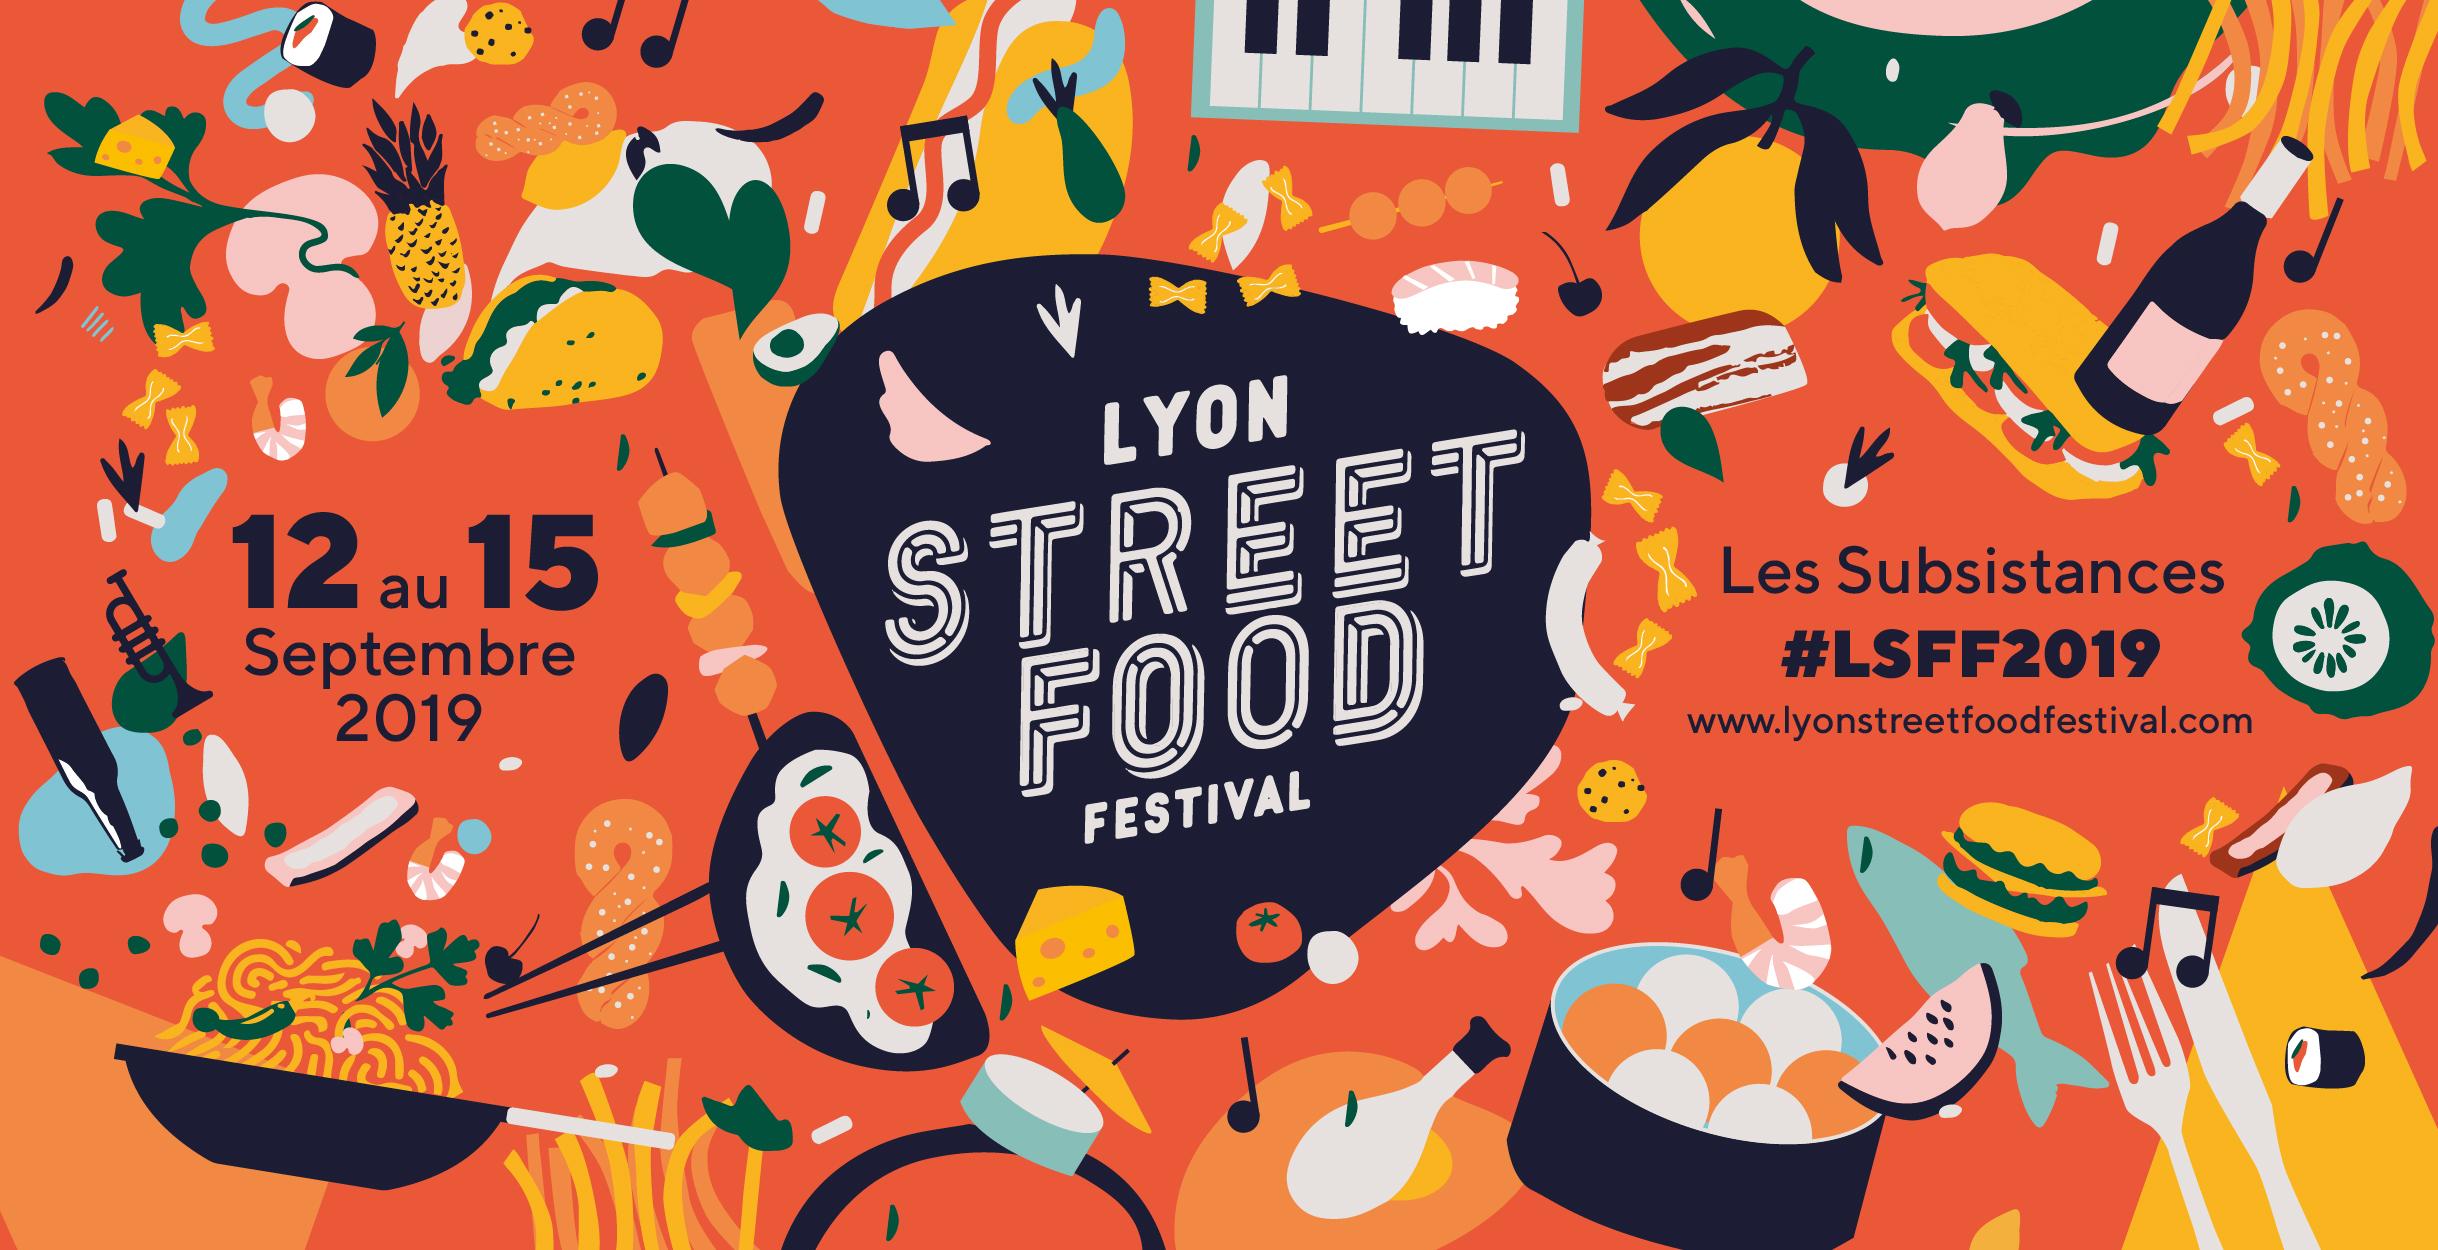 Lyon Street Food Festival 2019